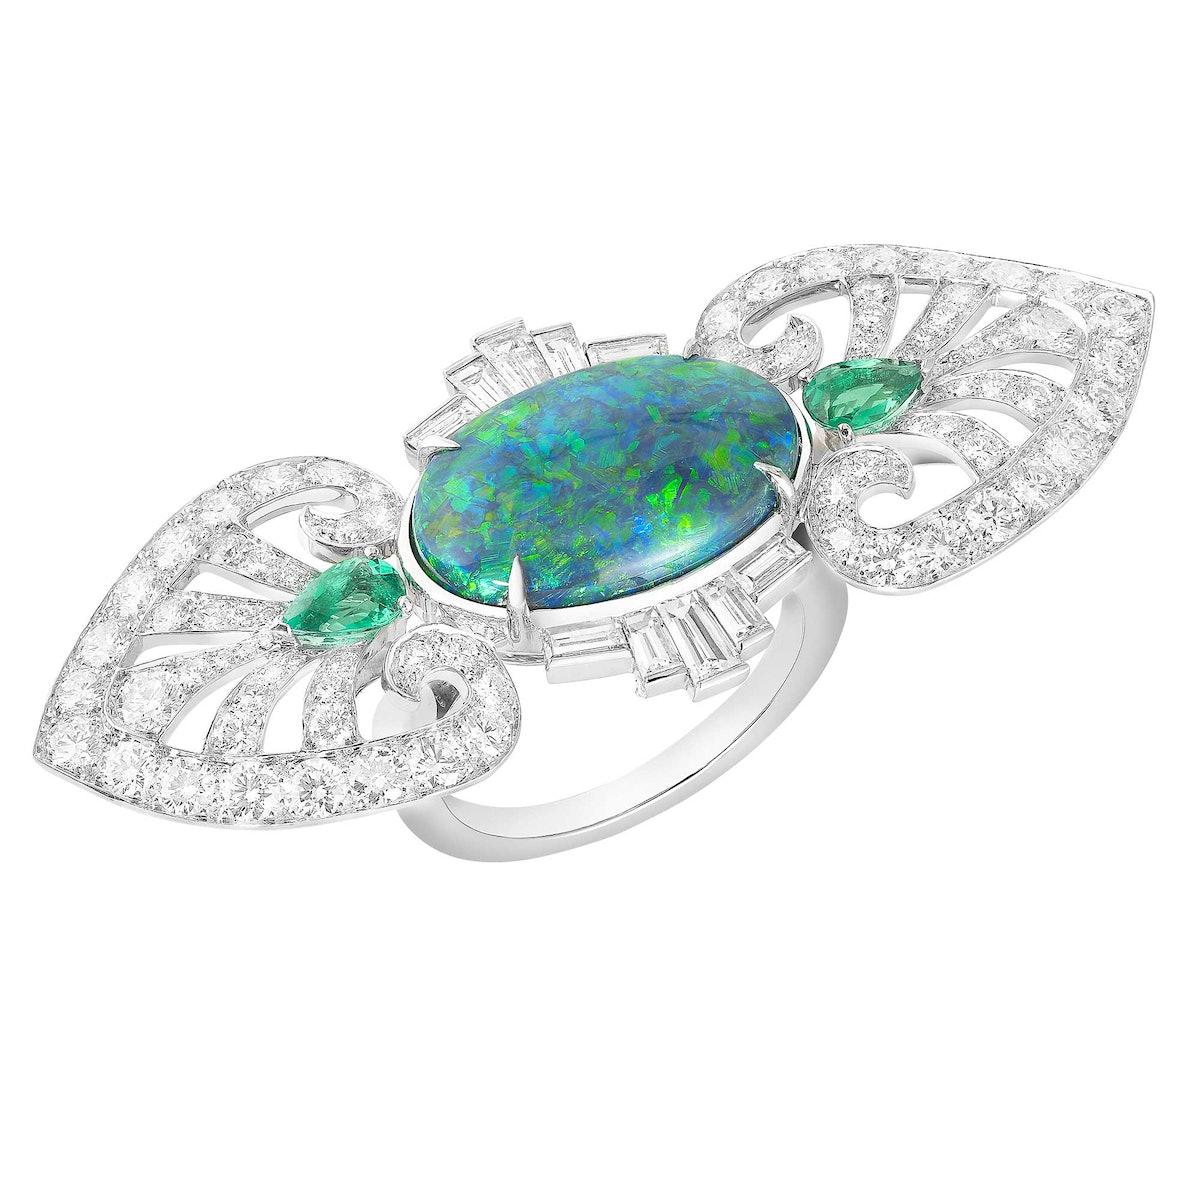 Boucheron Indian Palace Ring